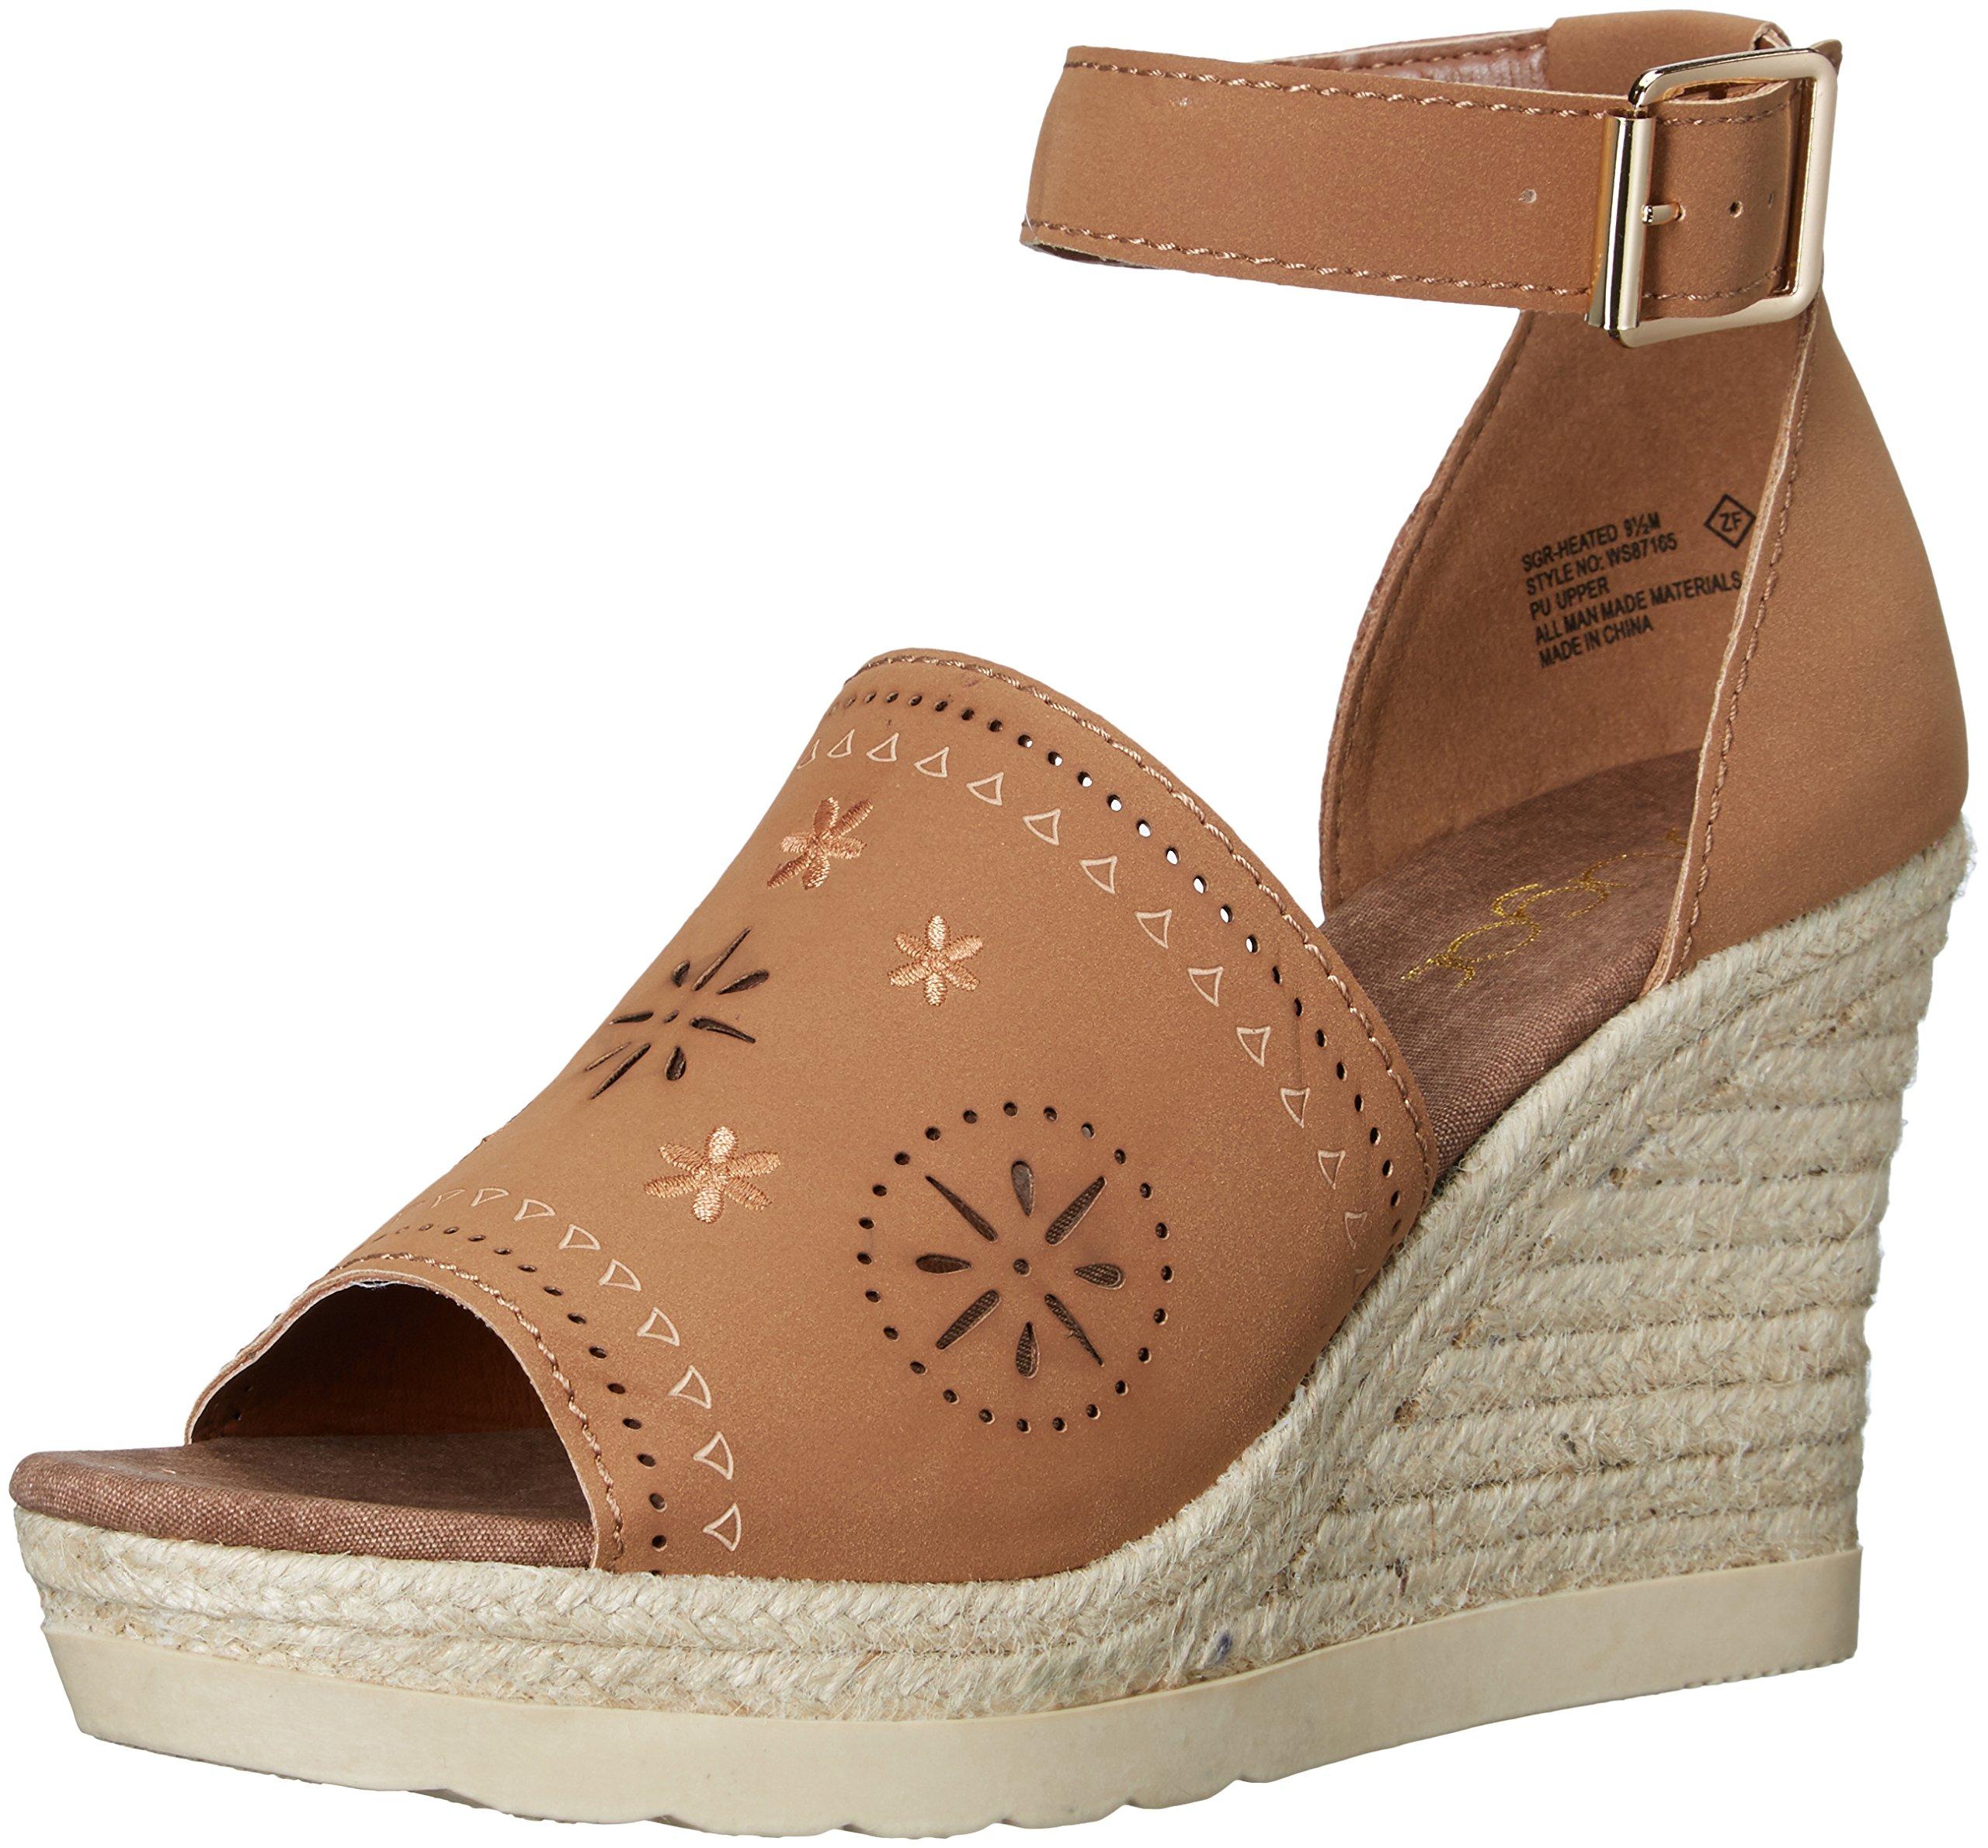 Sugar Women's SGR-Heated Espadrille Wedge Sandal, Honey Nubuck, 7 M US